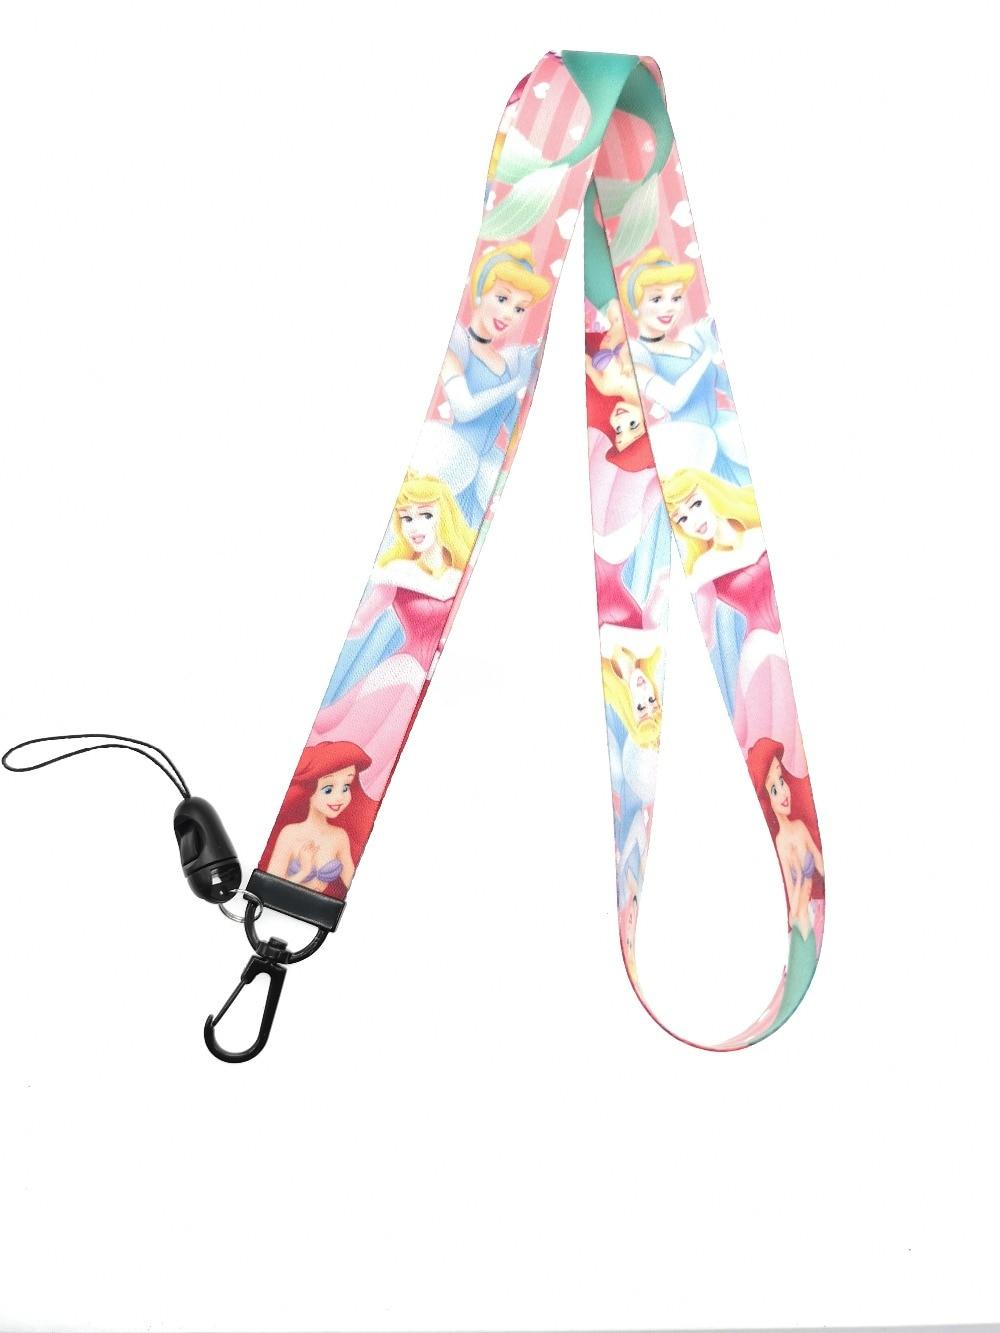 Lot  little mermaid Princess Lanyard  Neck Strap ID Badge Charms KeyChain Gift